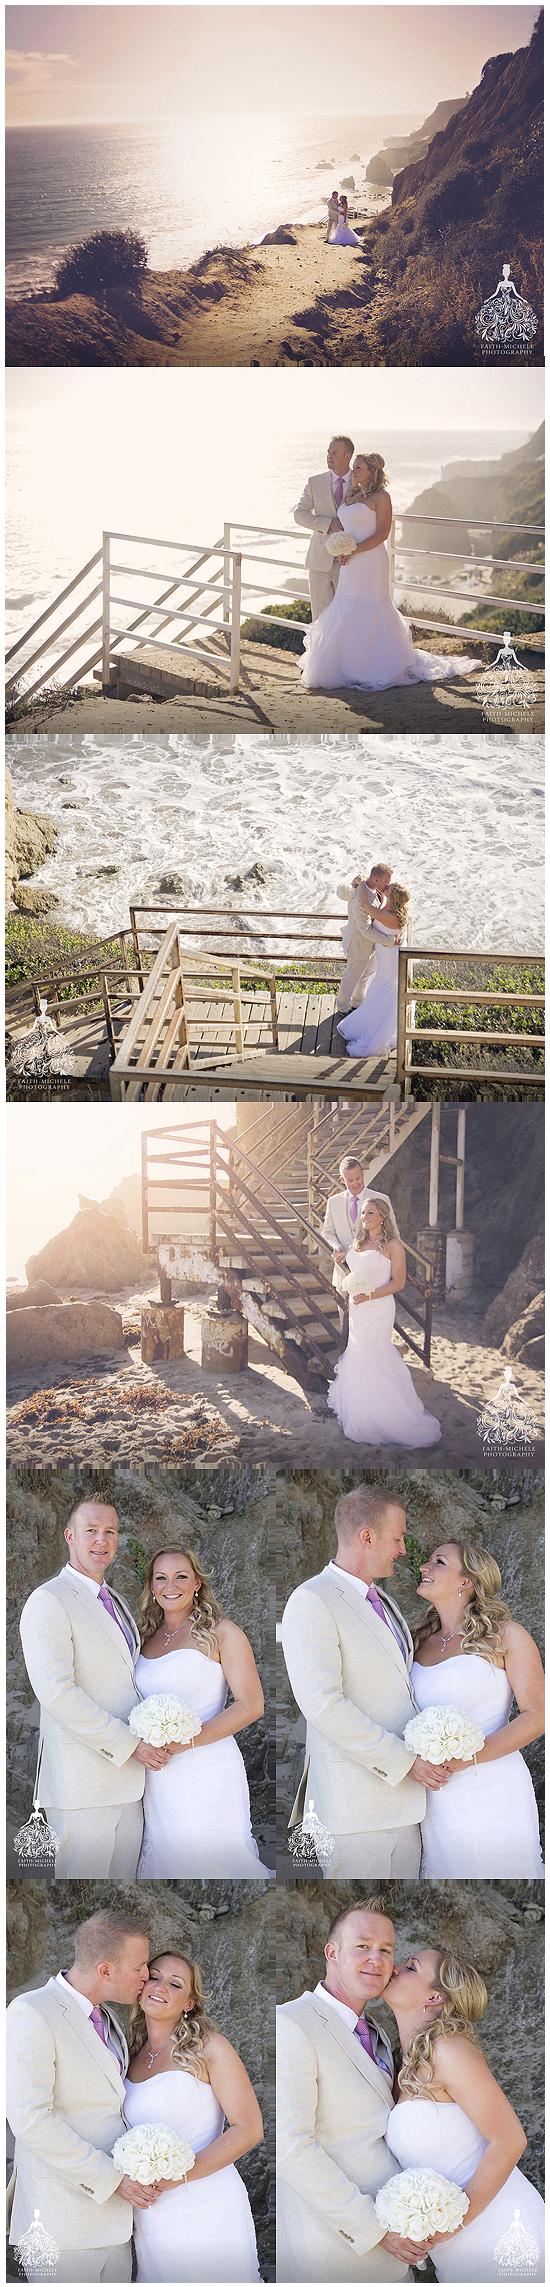 Los Angeles elopement photographer